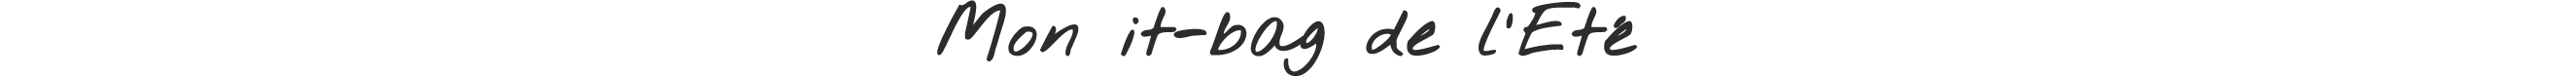 http://lookbook.allee-du-foulard.fr/wp-content/uploads/2018/06/0674-ADF-Accessoires-de-mode-LB-Estival-Titre-sac-2650x80.png